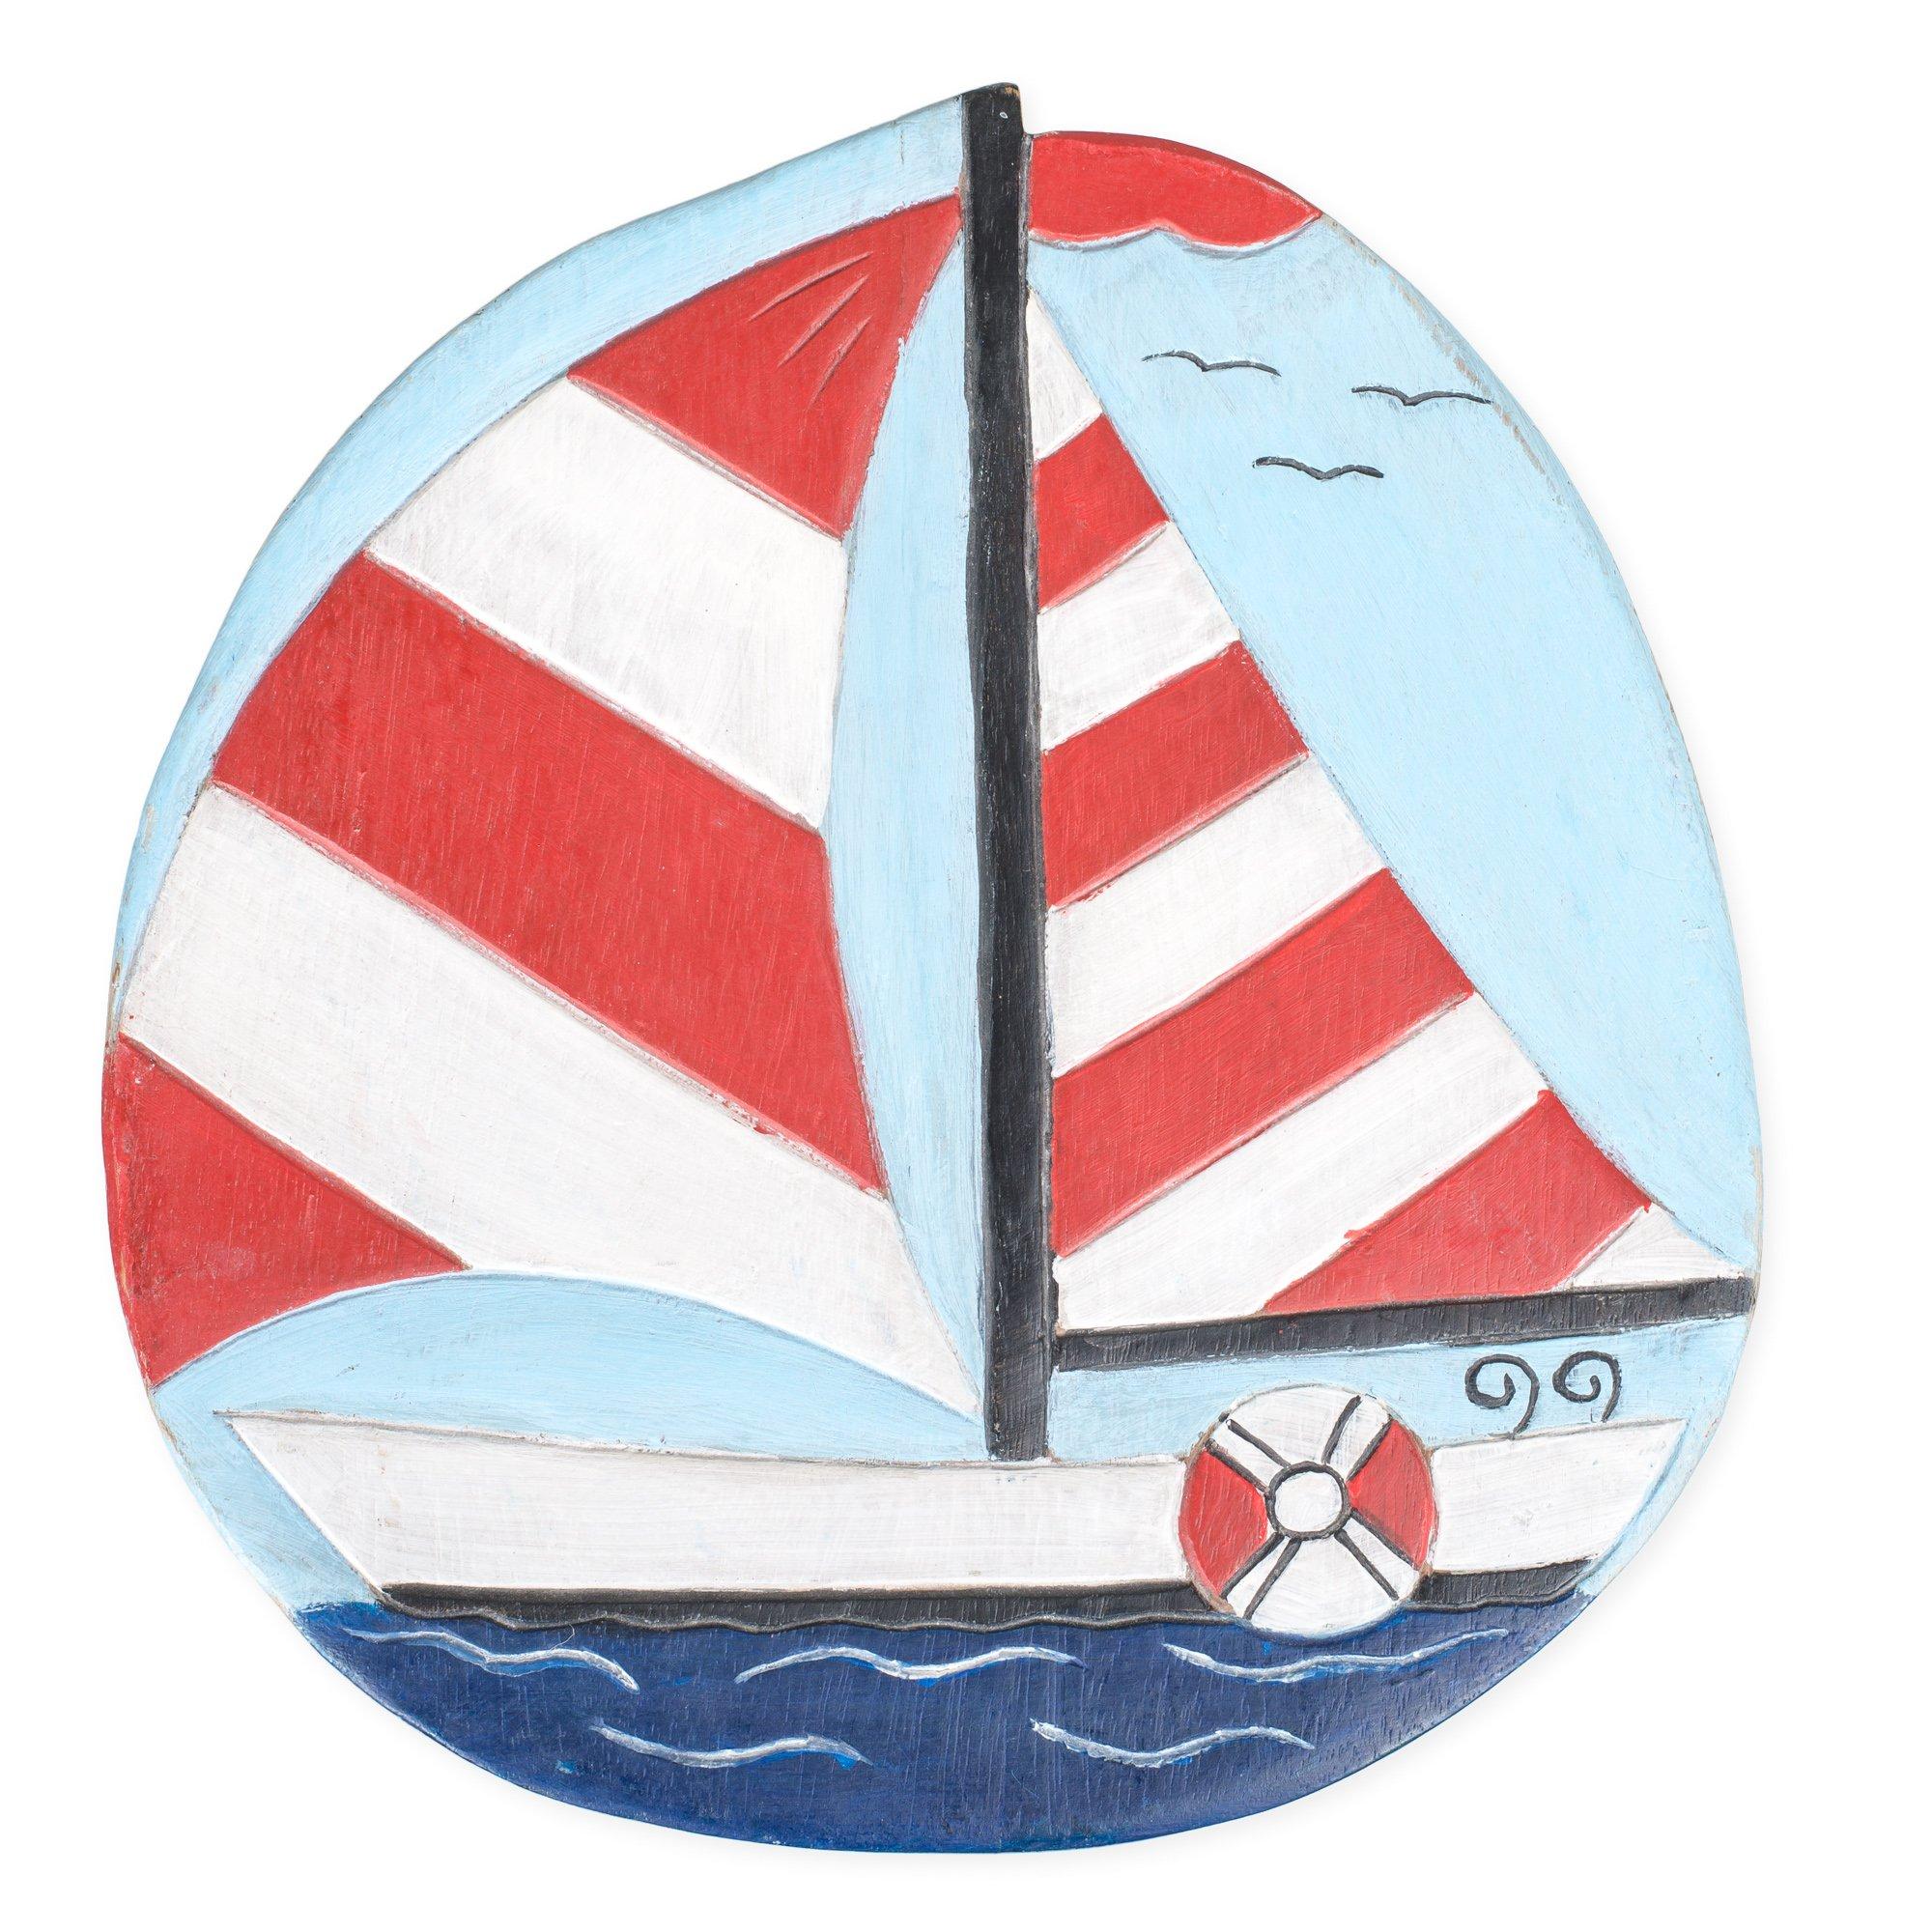 Sailboat Design Hand Carved Acacia Hardwood Decorative Short Stool by Sea Island (Image #4)